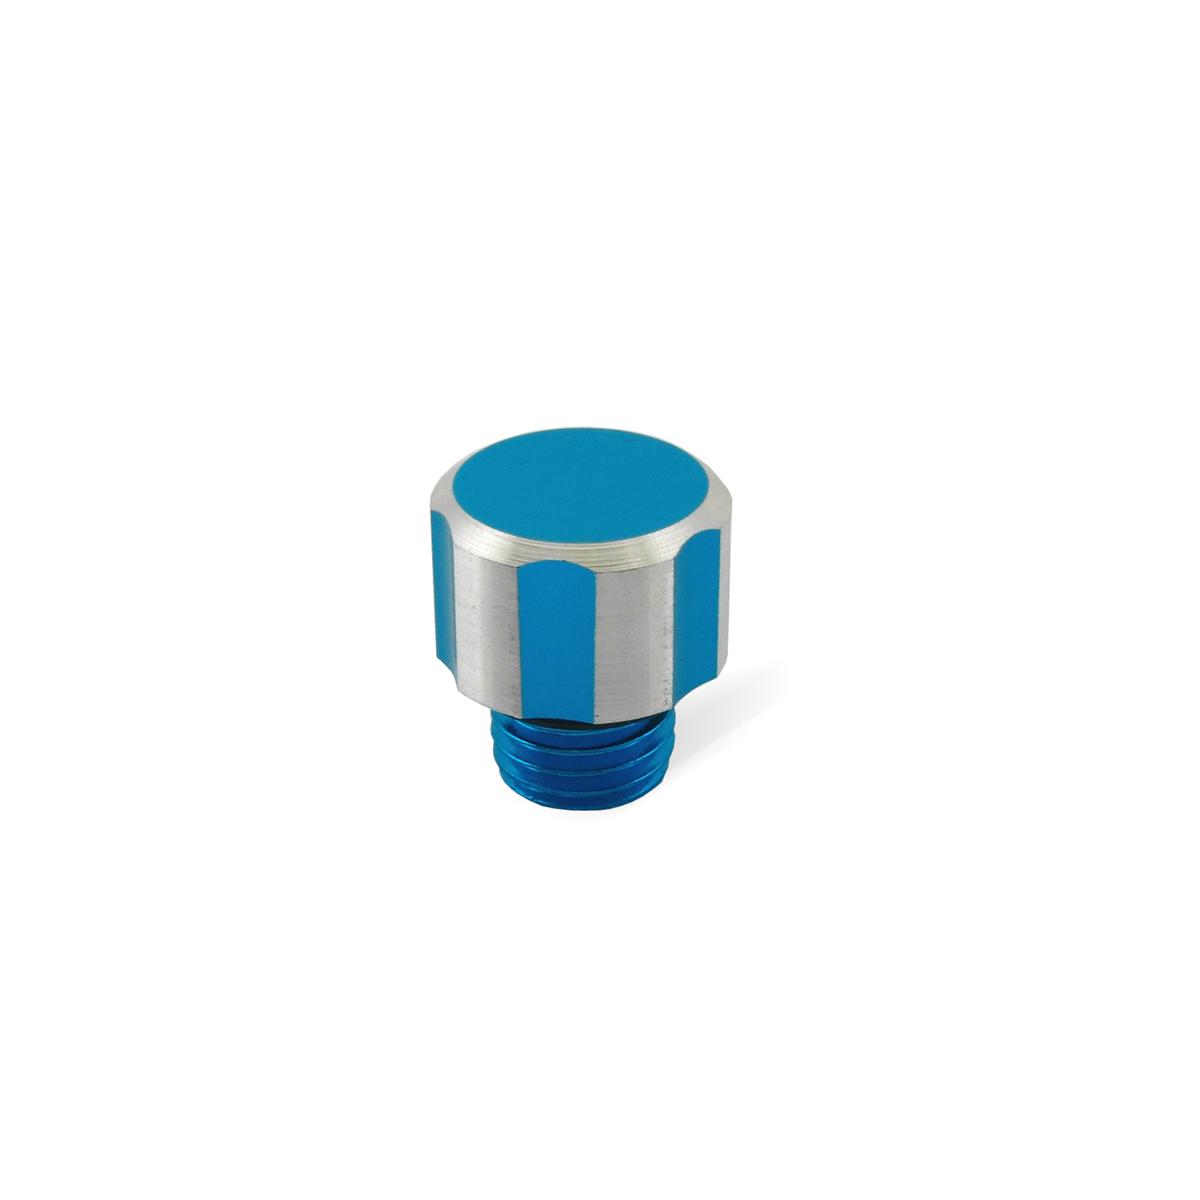 Bouchon Huile Derbi Senda Alu - Bleu anodisé